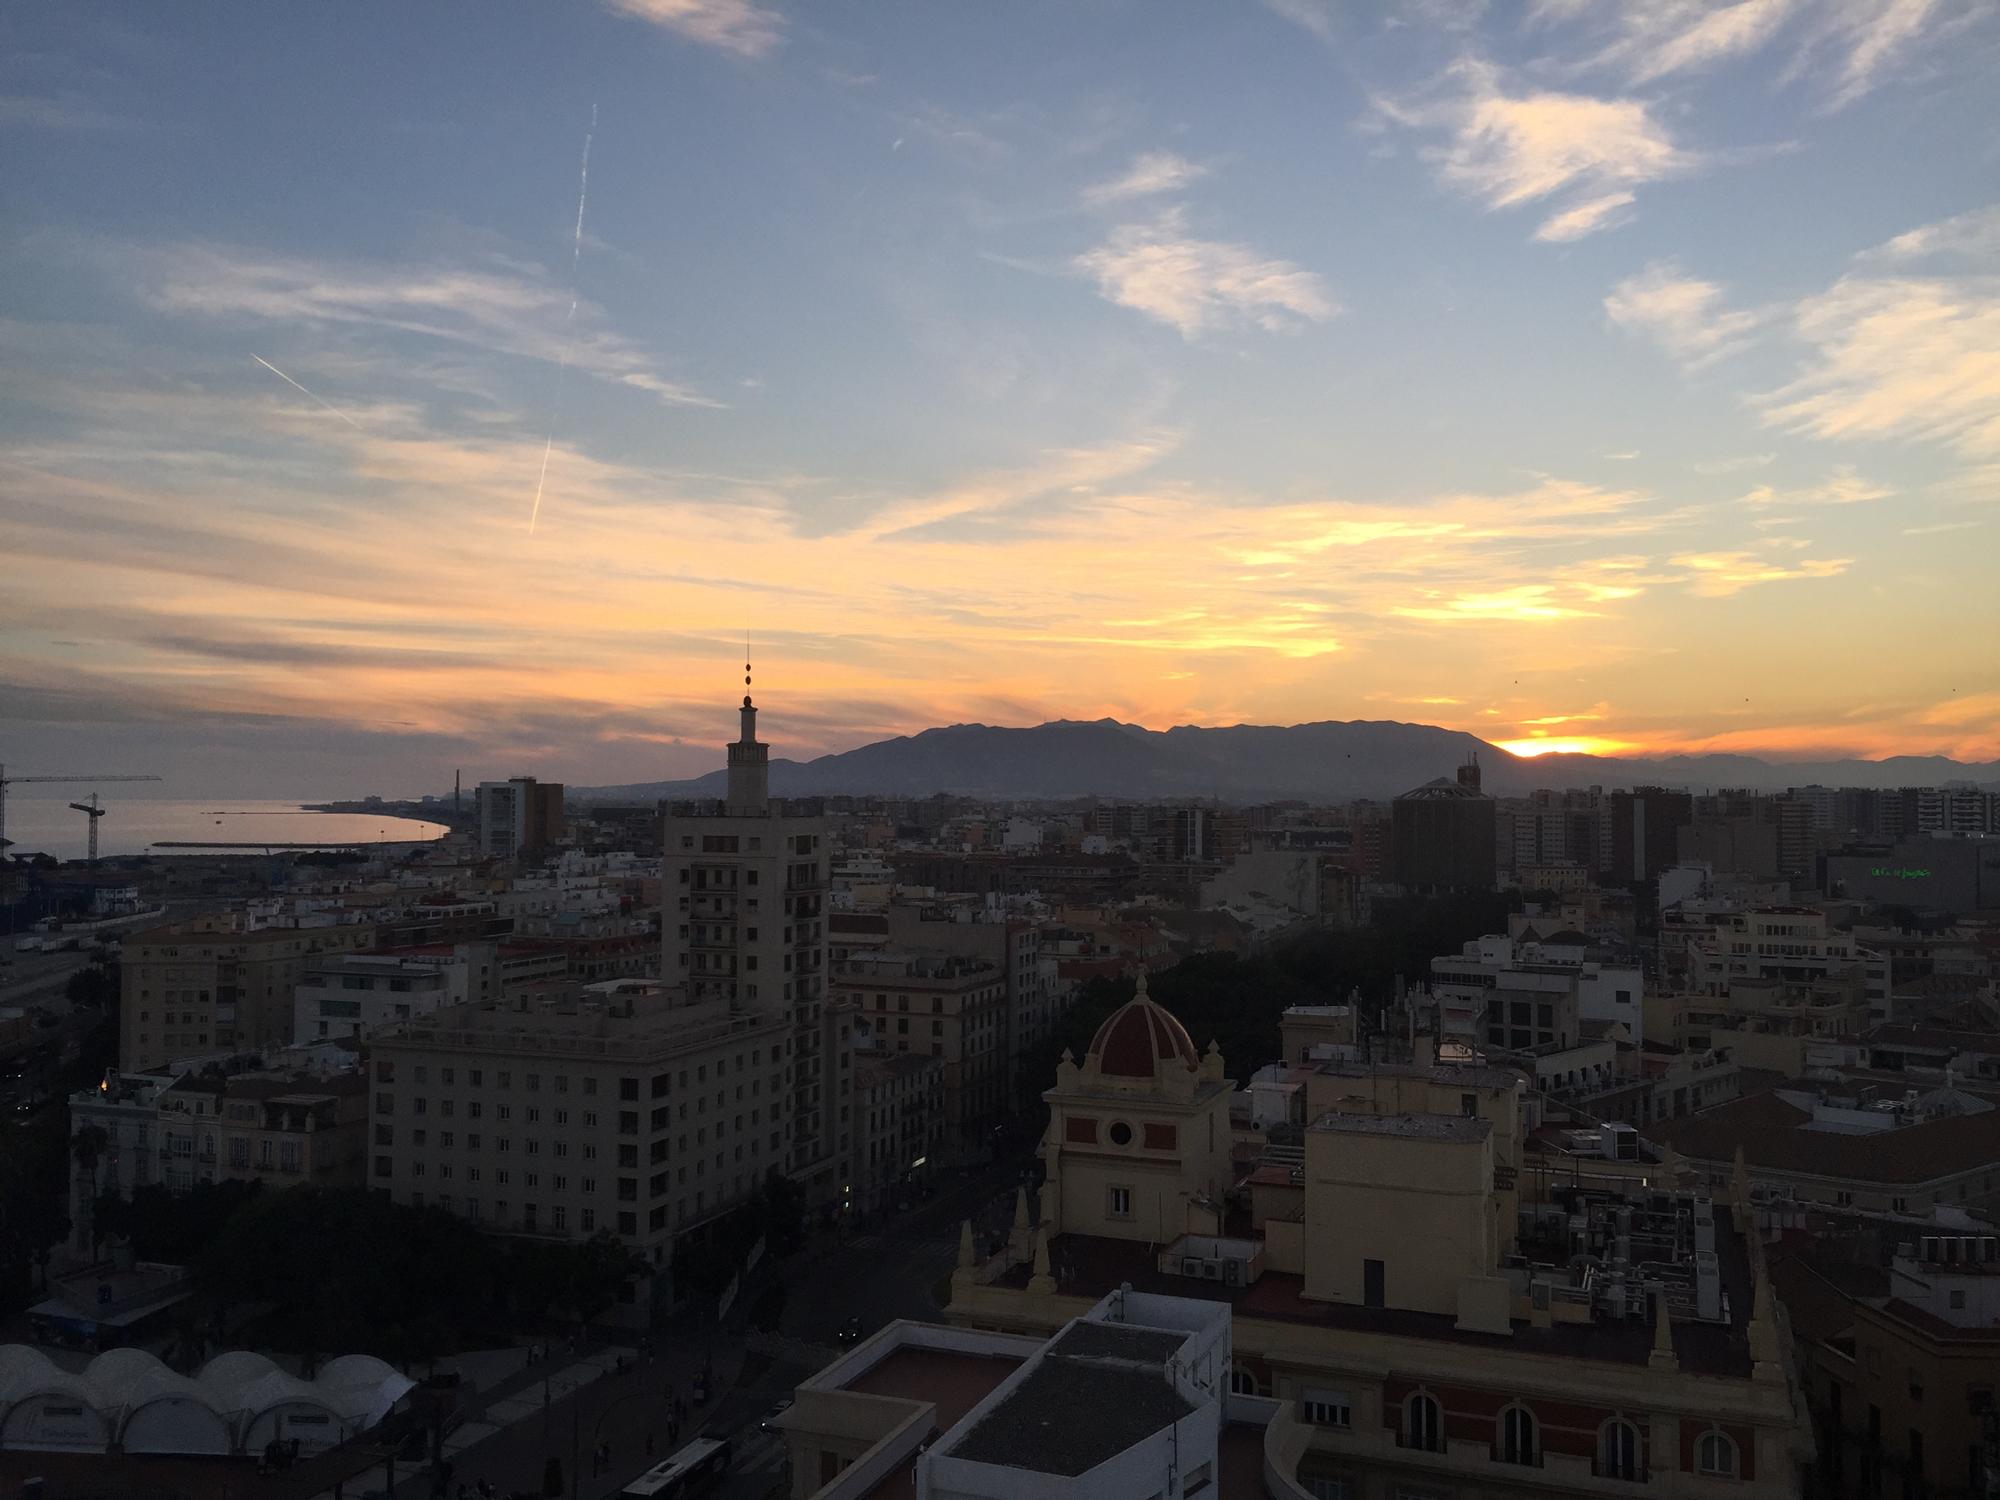 Sunset from a rooftop bar, Malaga, Spain, November